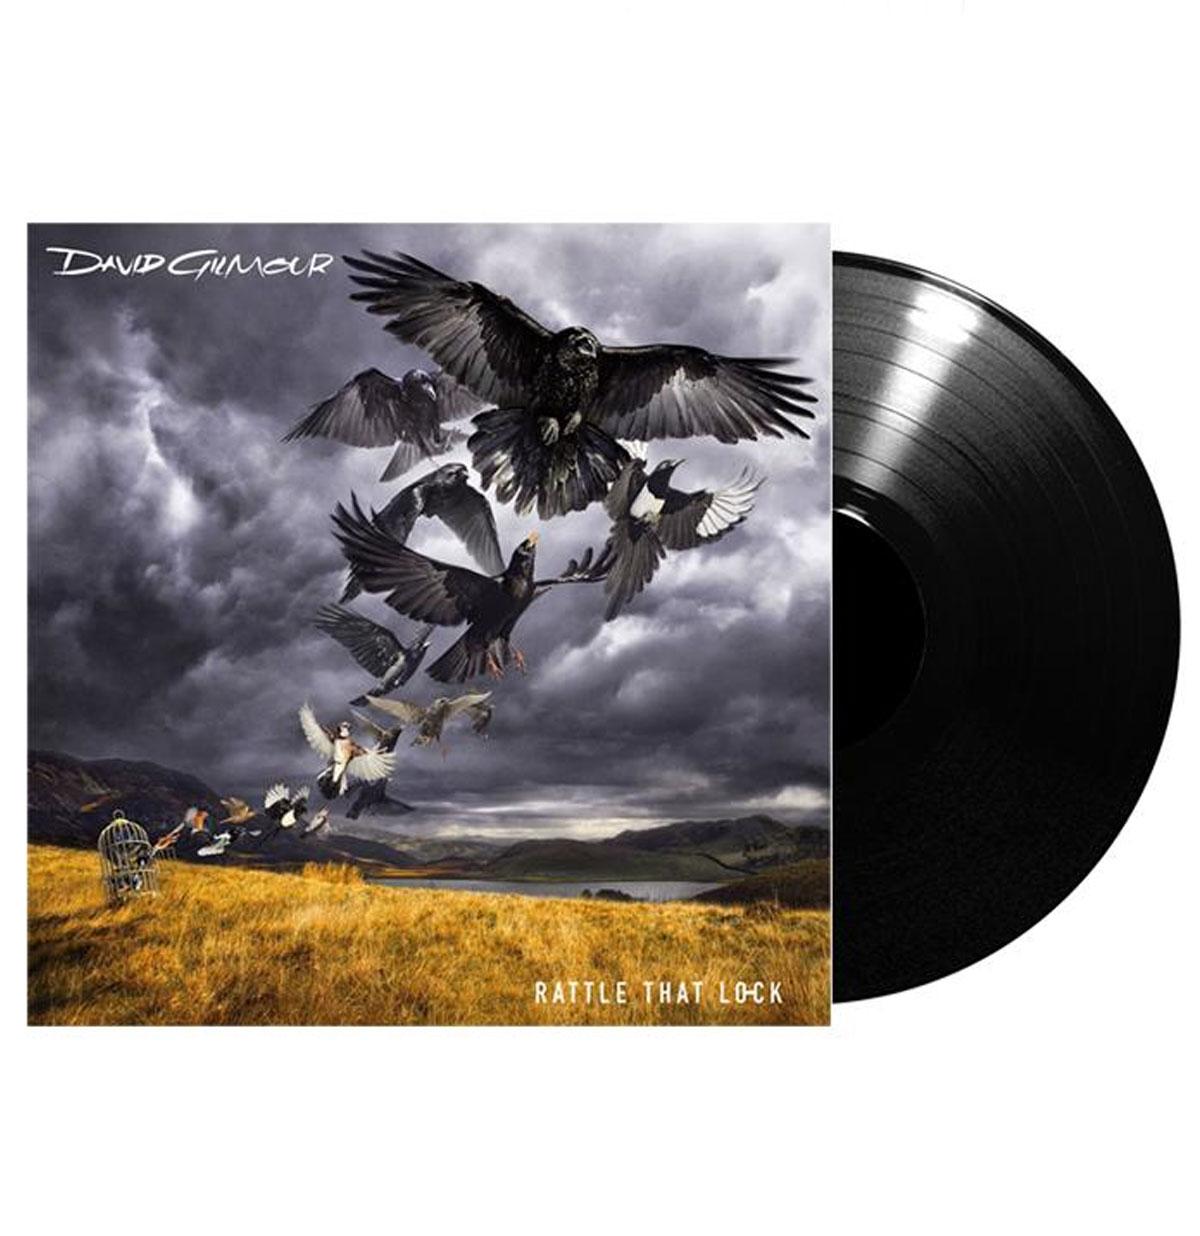 David Gilmour - Rattle That Lock LP